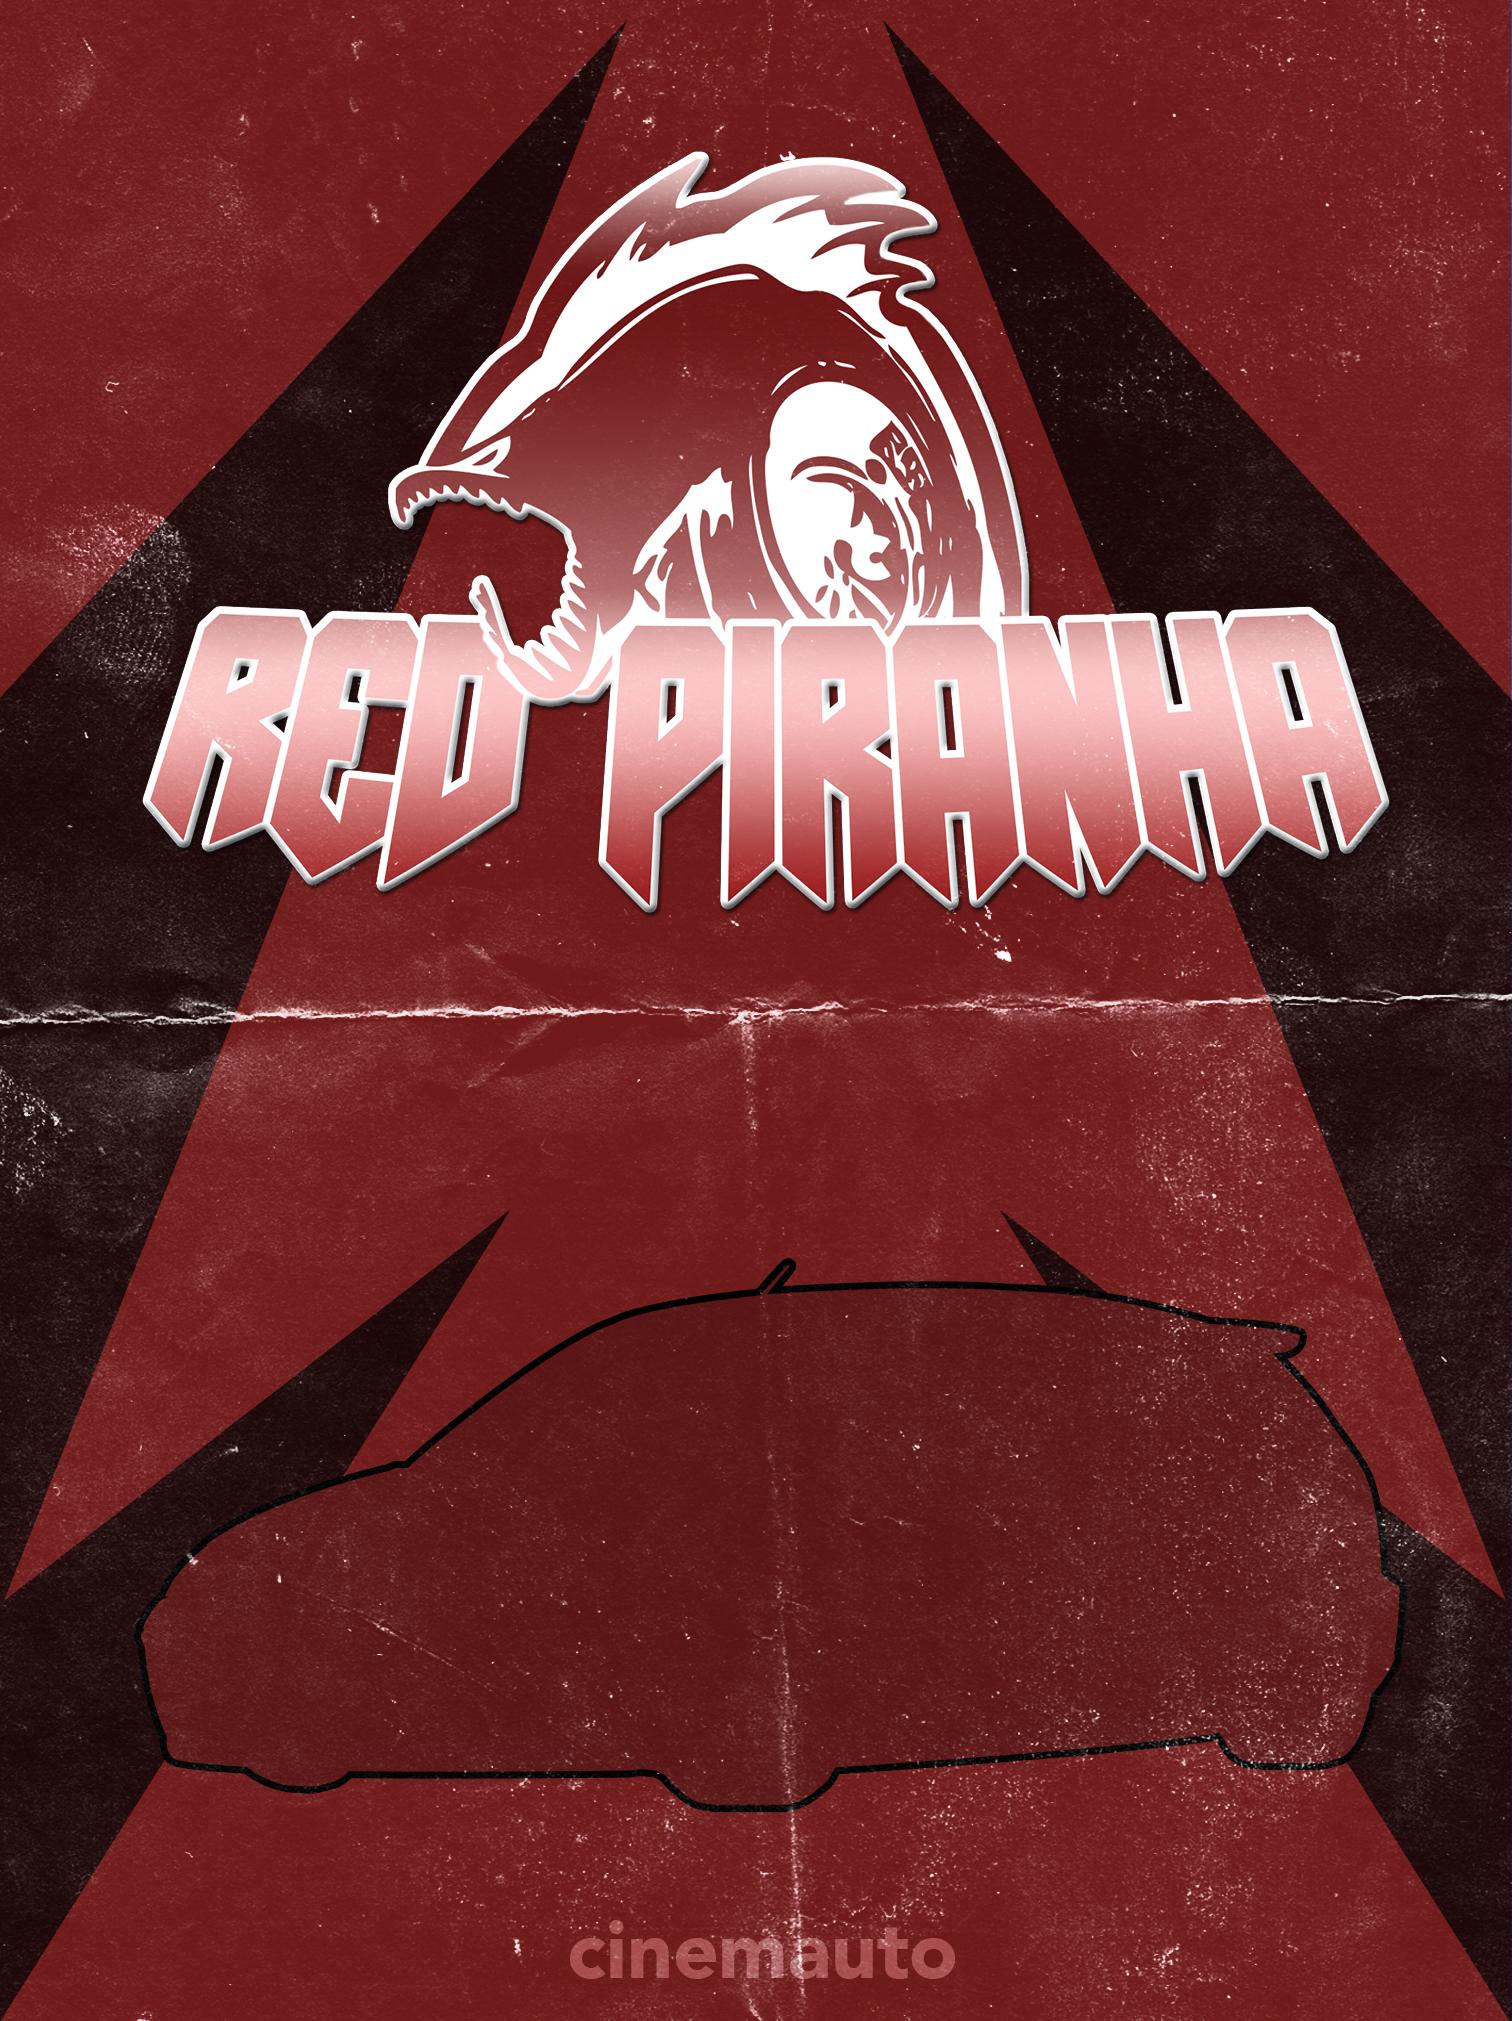 Posters-RedPiranha.jpg